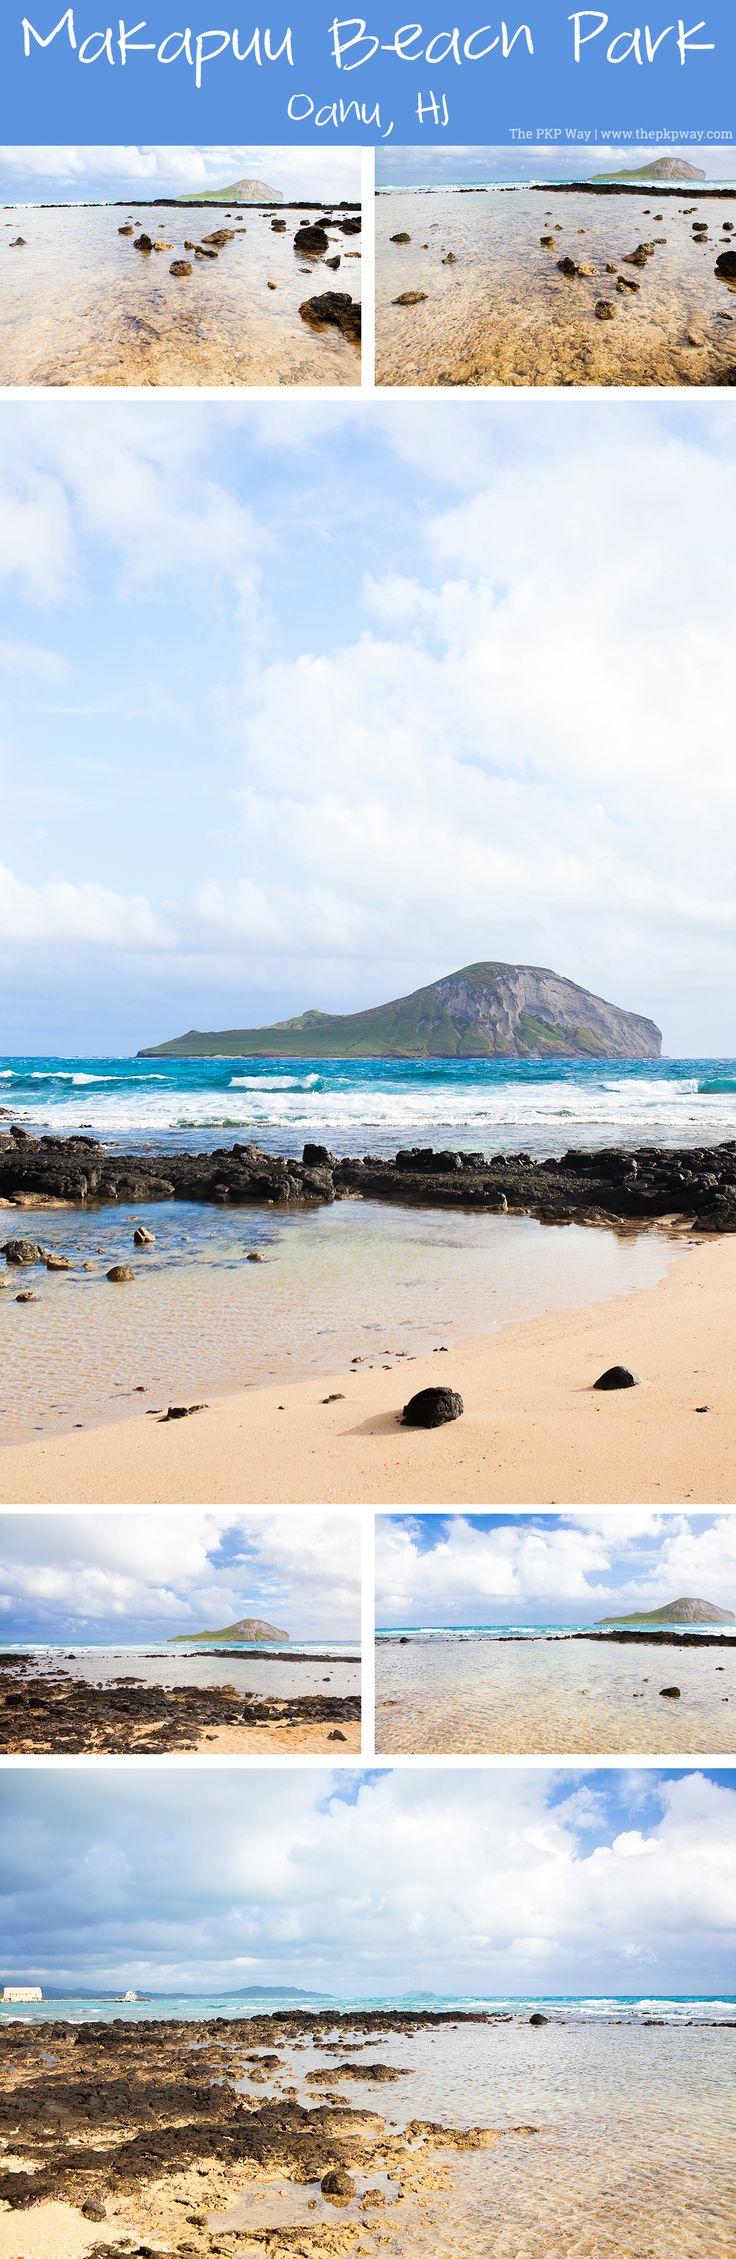 The PKP Way | A Weekend in Oahu, Hawaii | Makapuu Beach Park http://www.thepkpway.com